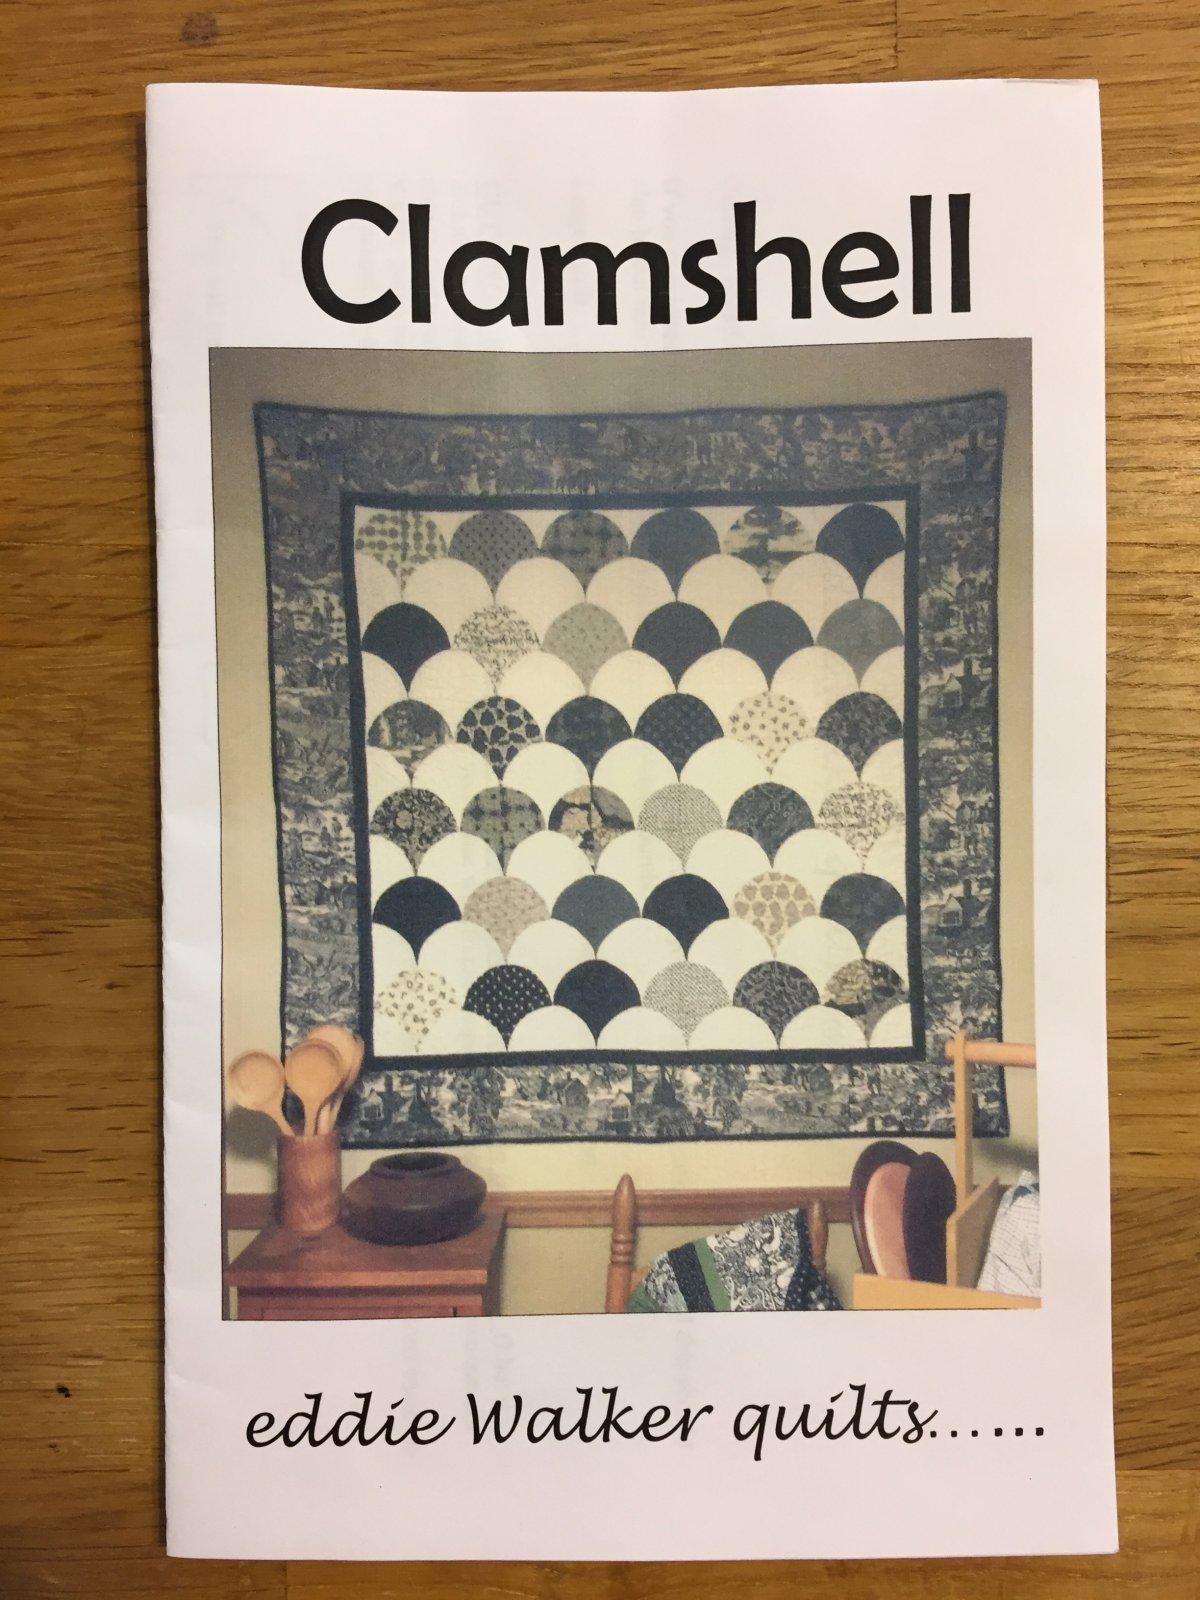 Eddie's Clamshell